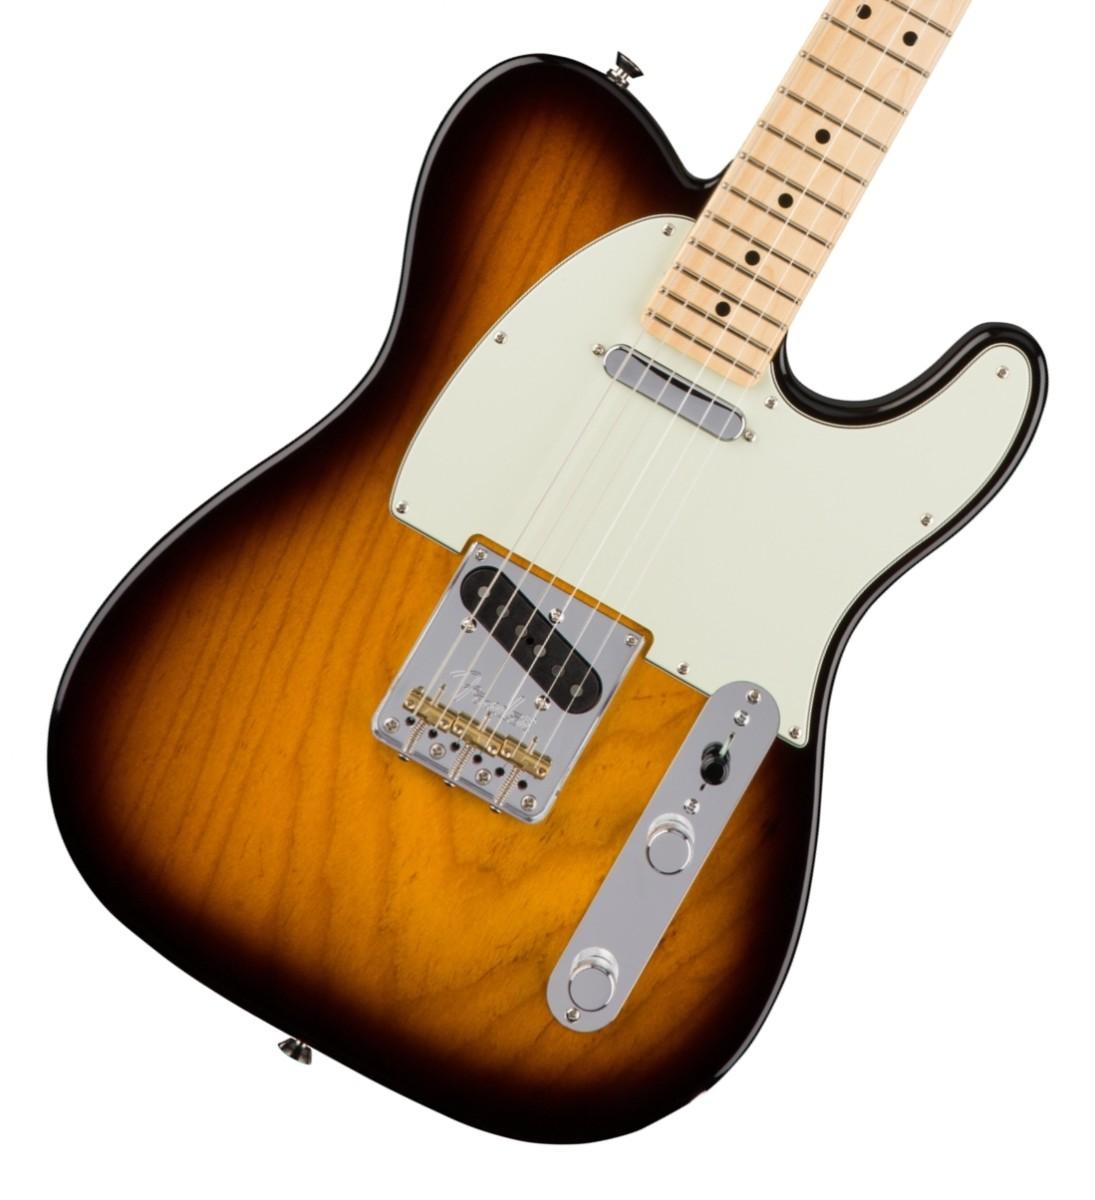 Fender USA / American Pro Telecaster 2-Color Sunburst Maple フェンダー《カスタムショップのお手入れ用品を進呈/+671038200》《フェンダー純正グッズを進呈/+79083》